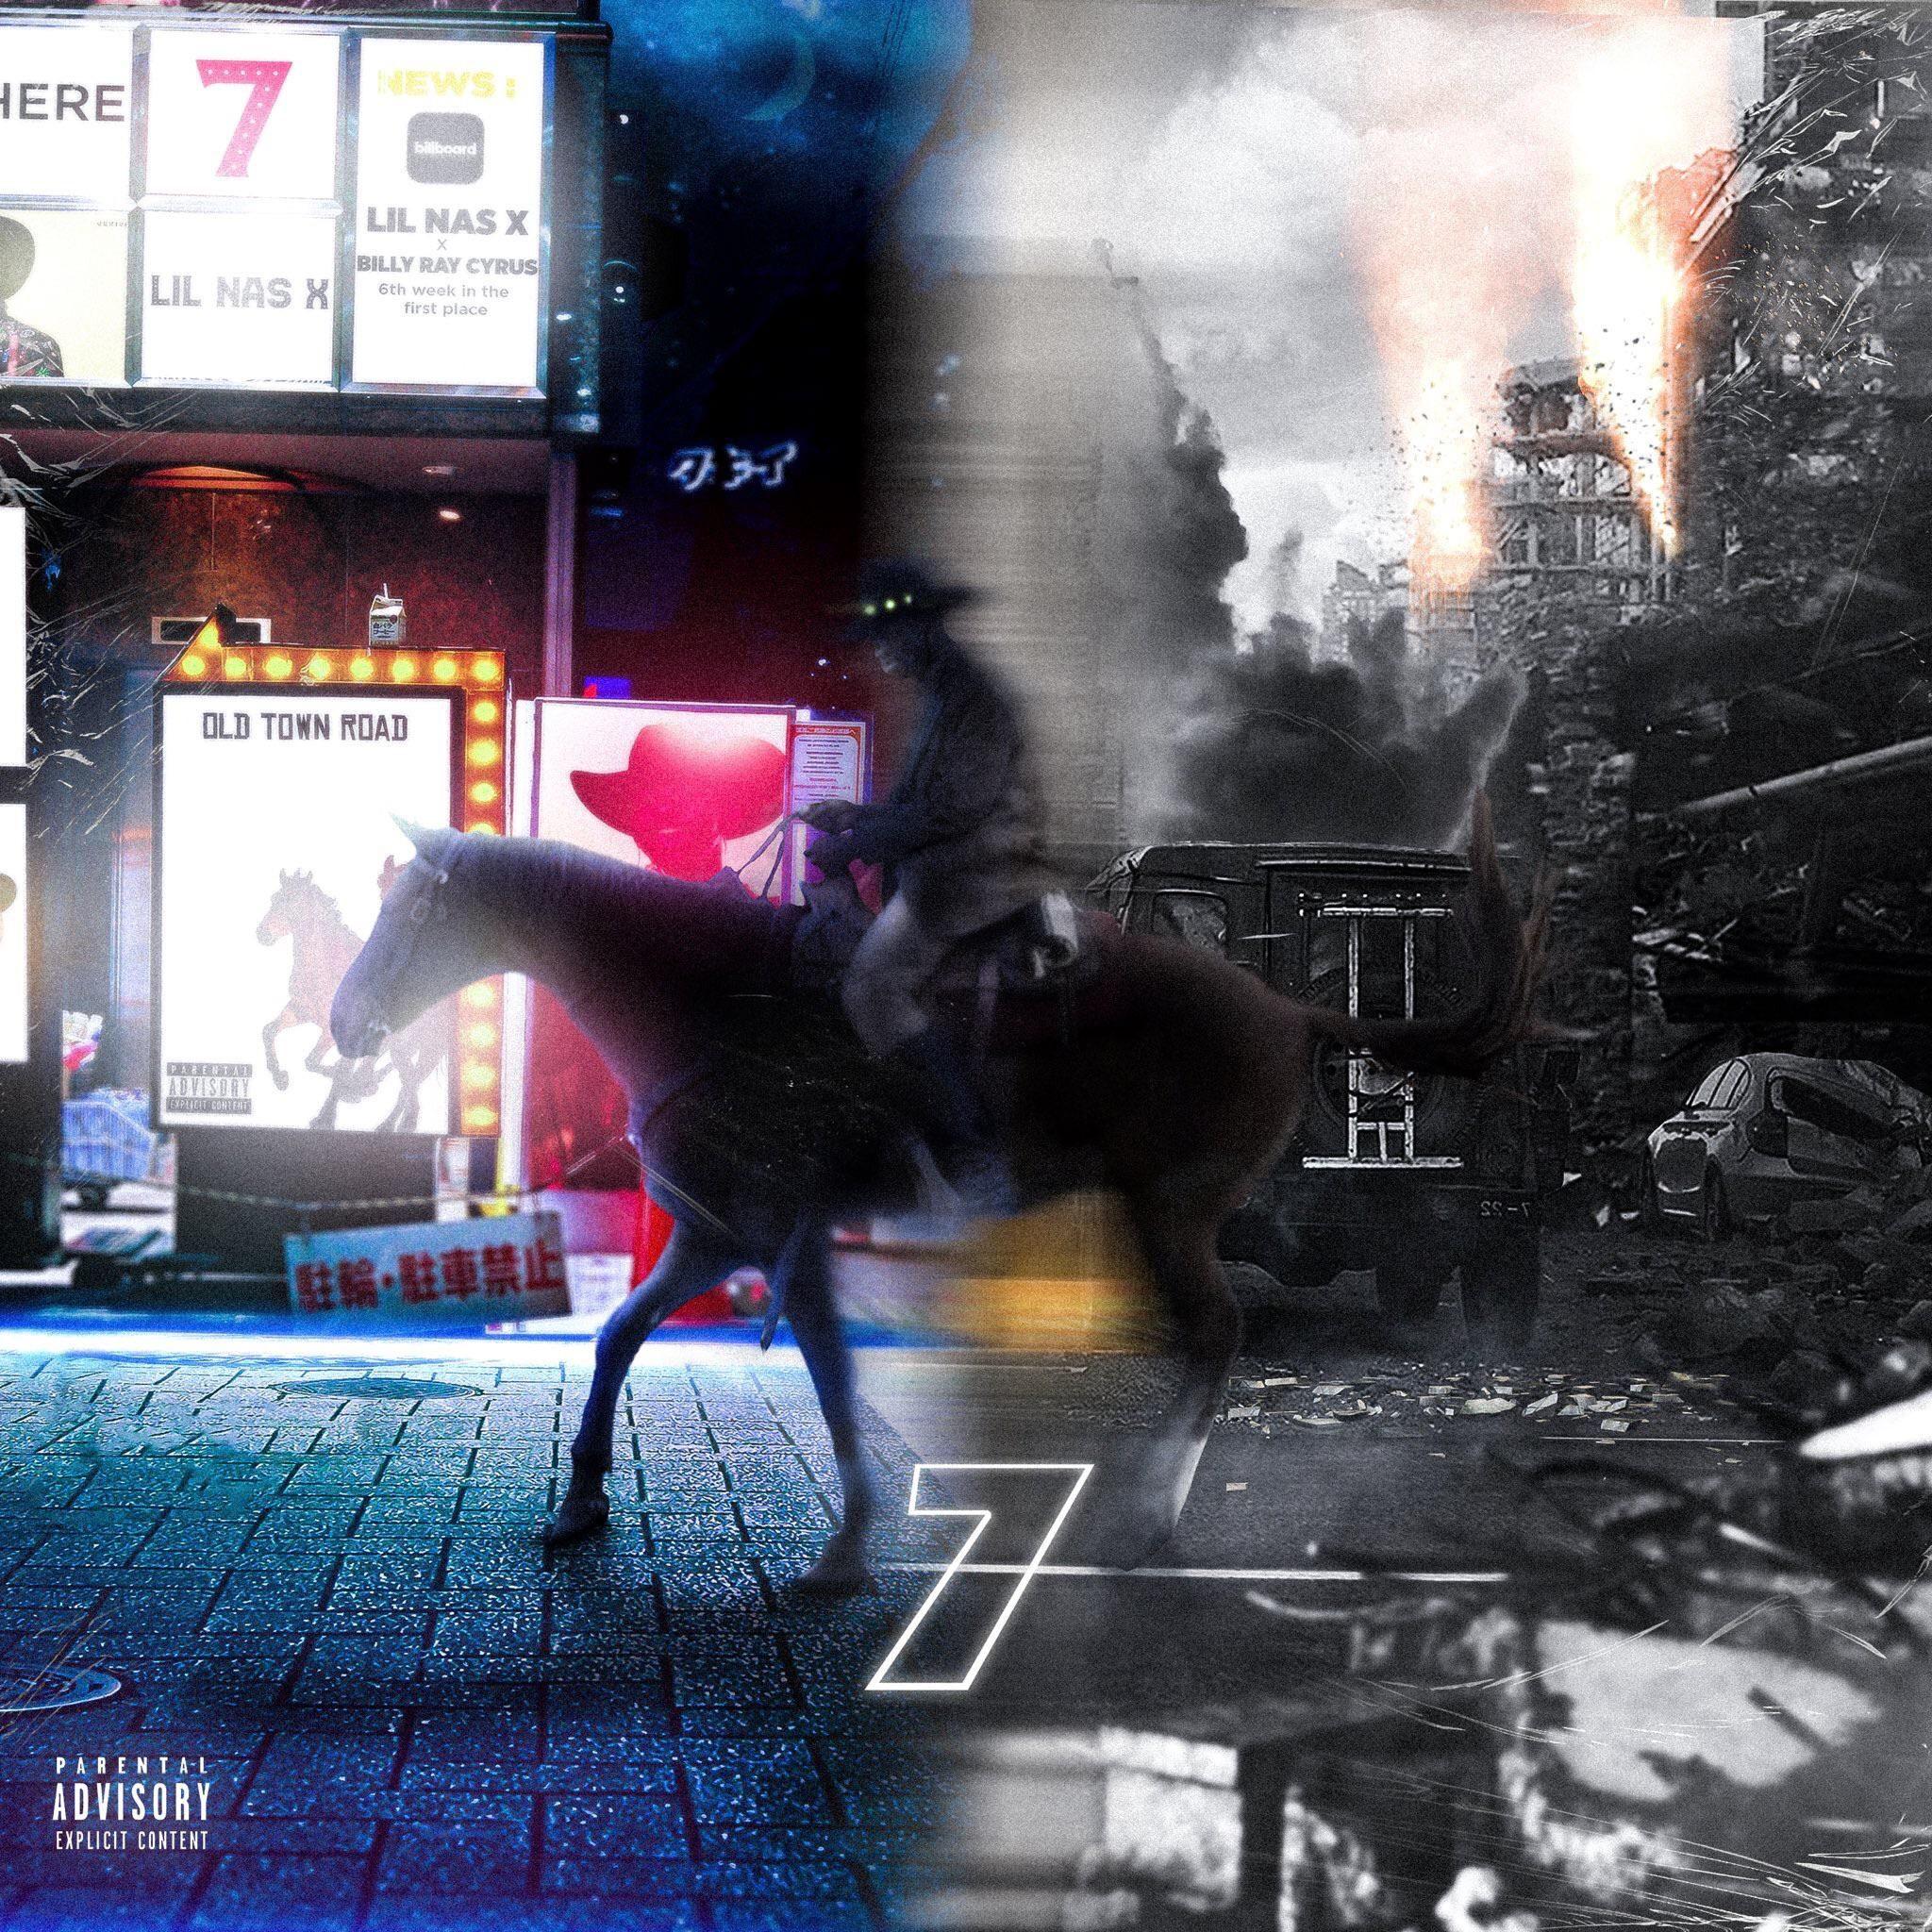 Lil nas x 7 with images artist names r vinyl album art